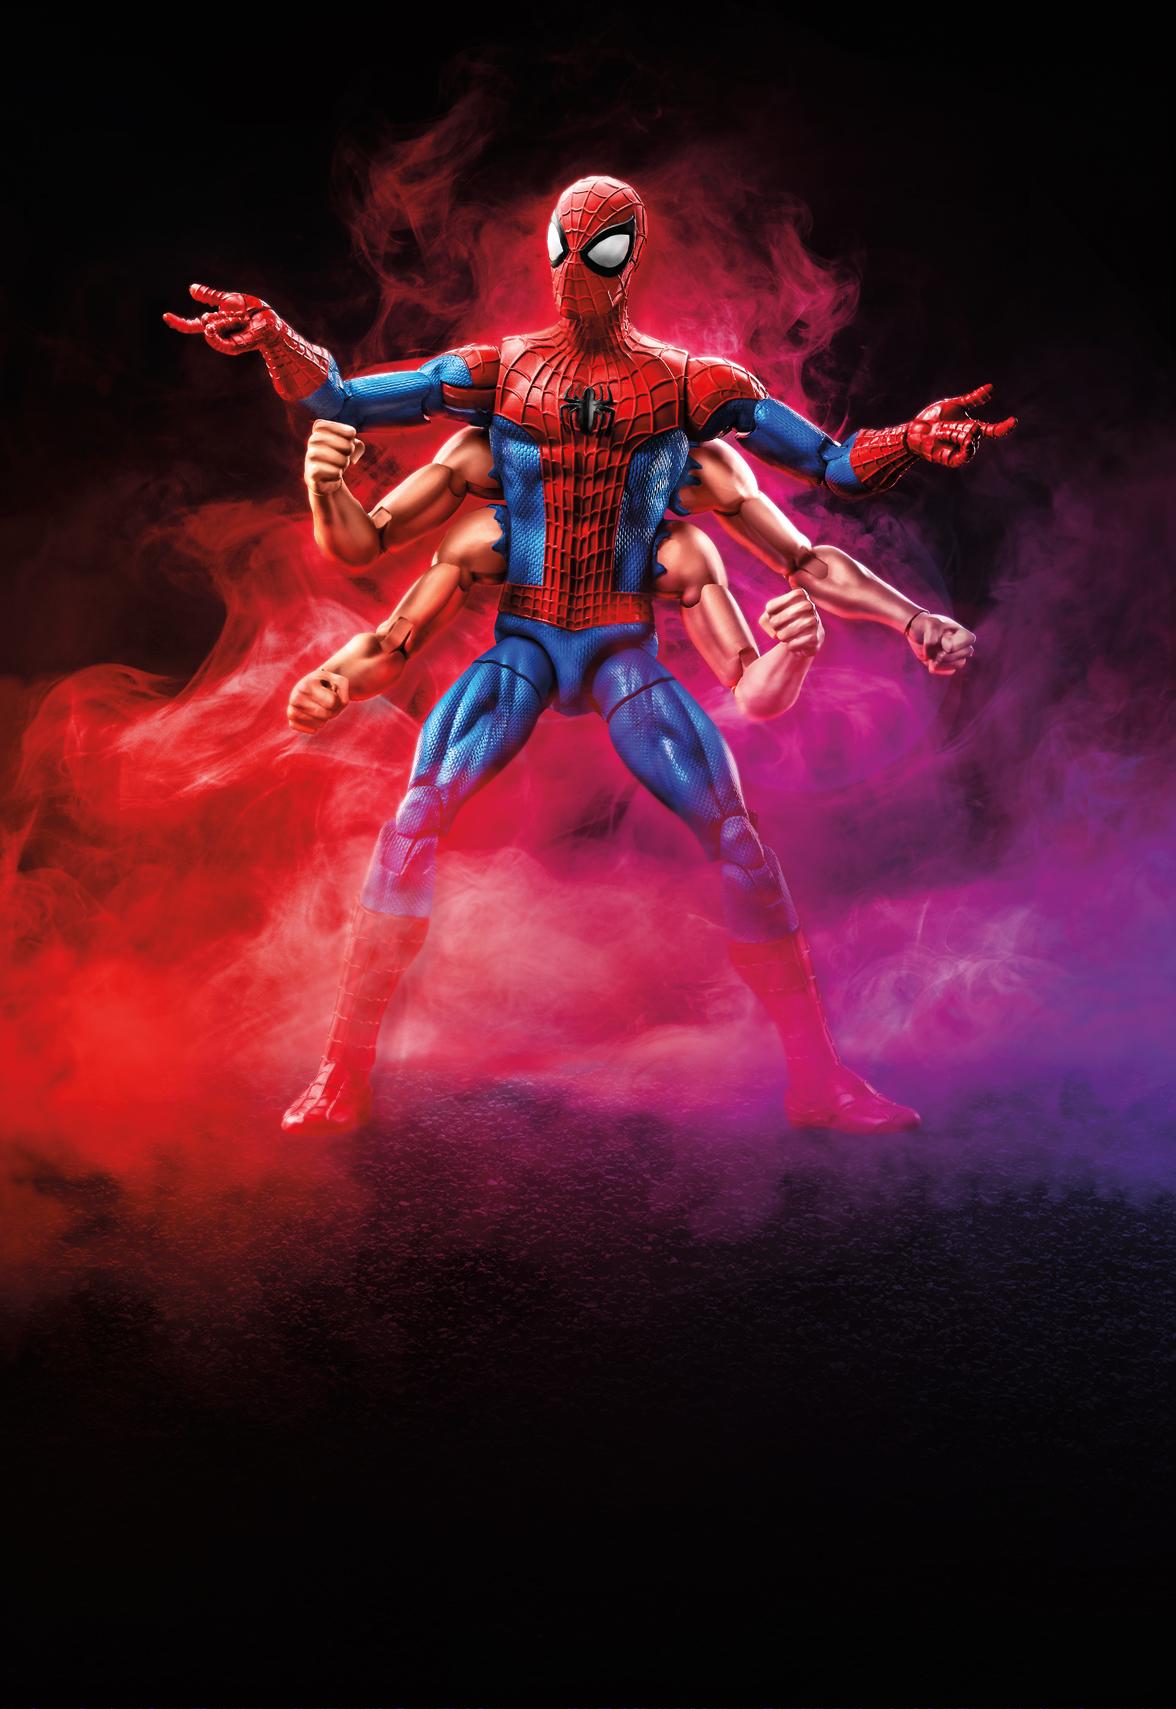 Squad Marvel Figures Action Hero Super